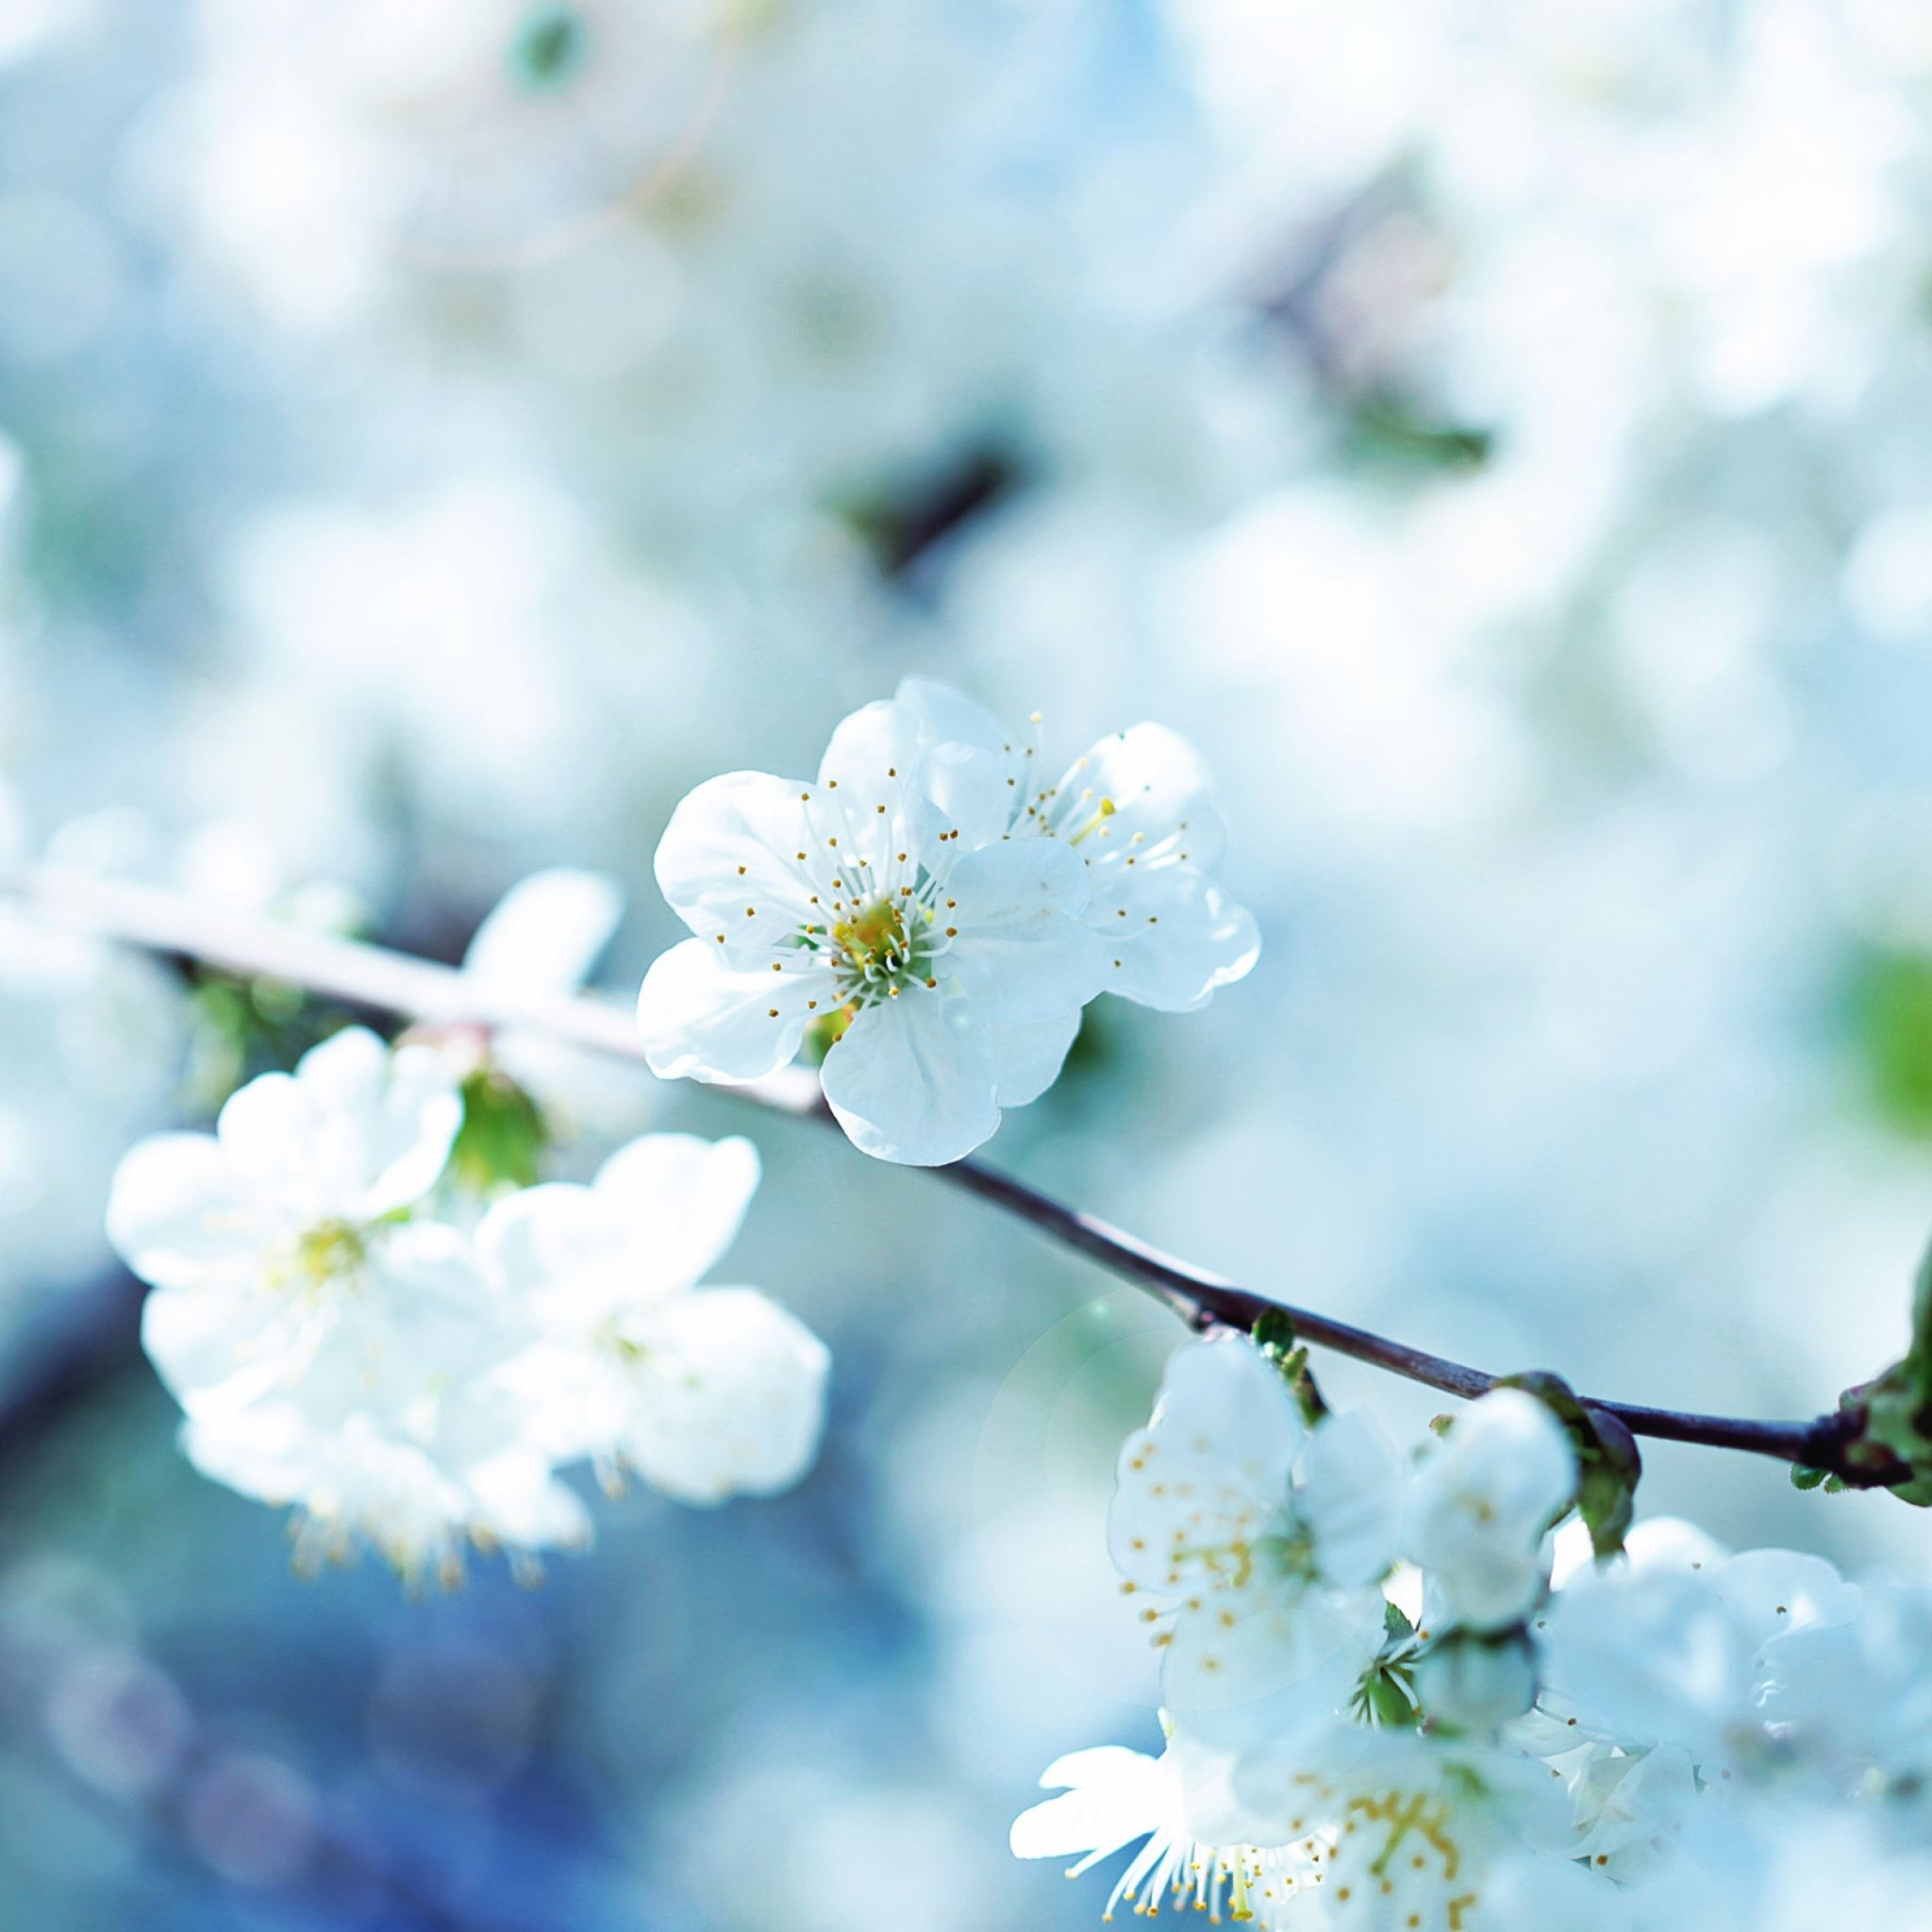 Flowers flowering branch plant spring iPad Air wallpaper